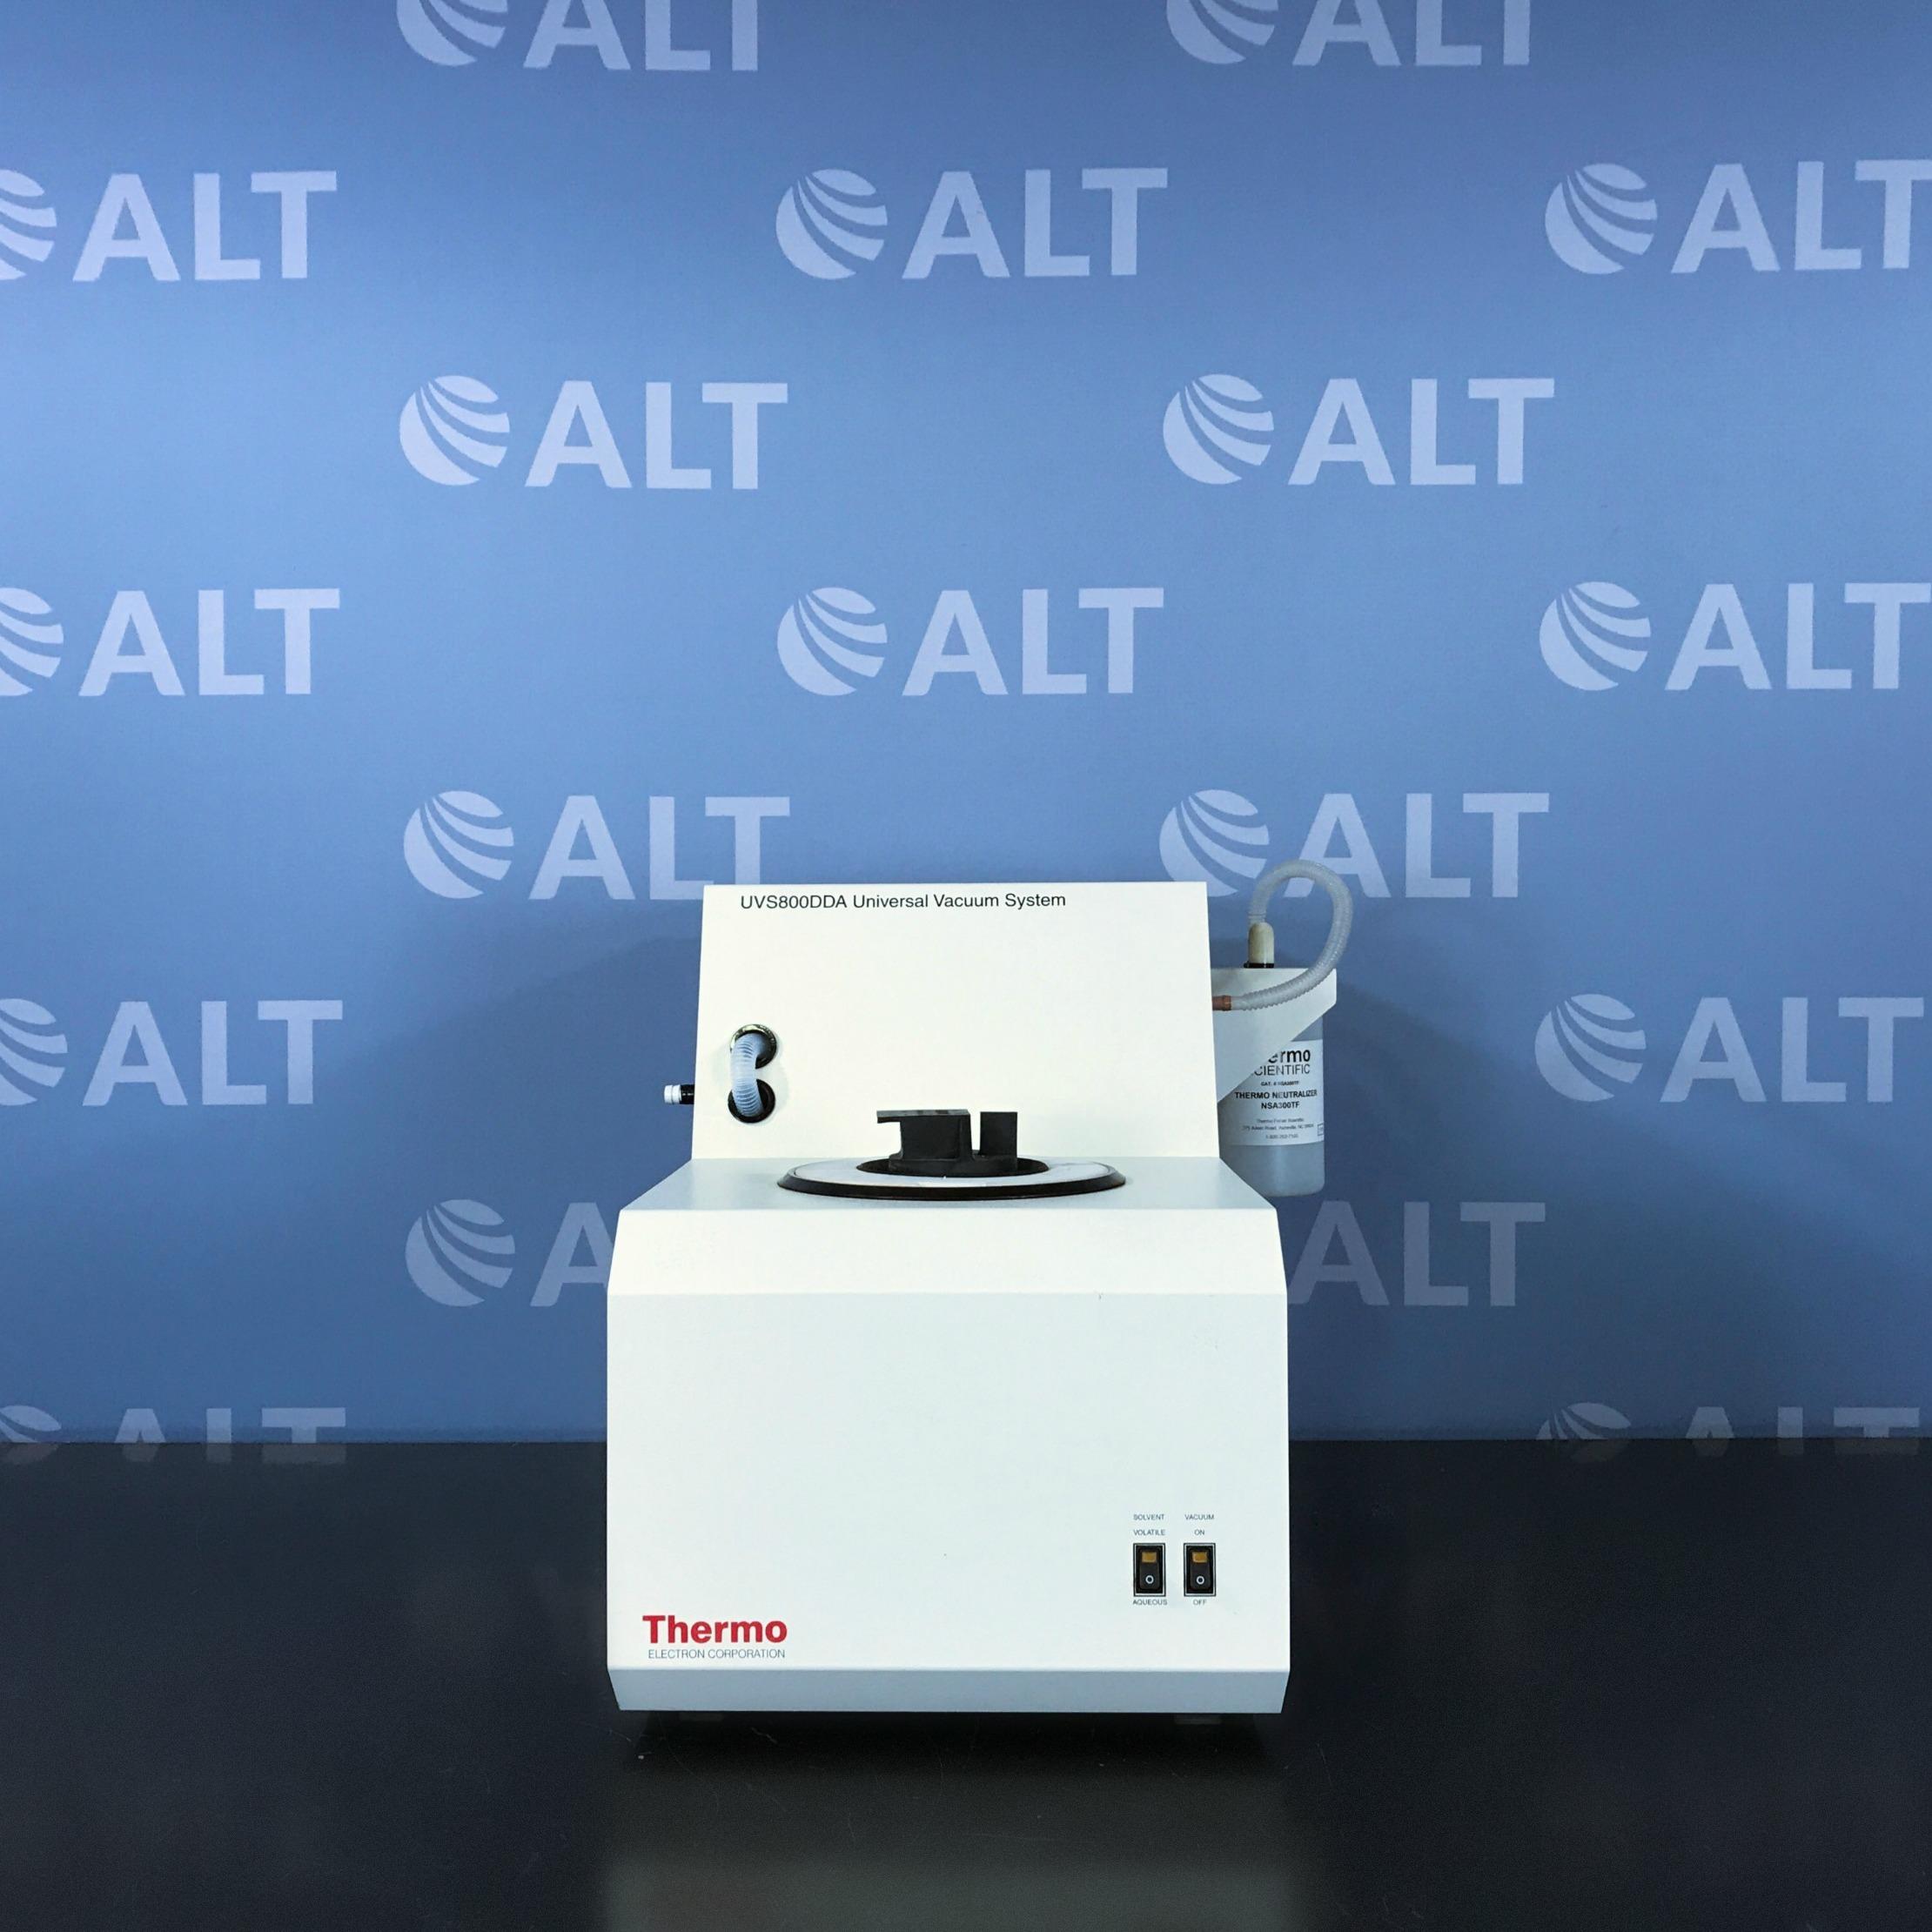 Thermo / Savant UVS800DDA Universal Vacuum System Plus with VaporNet Image